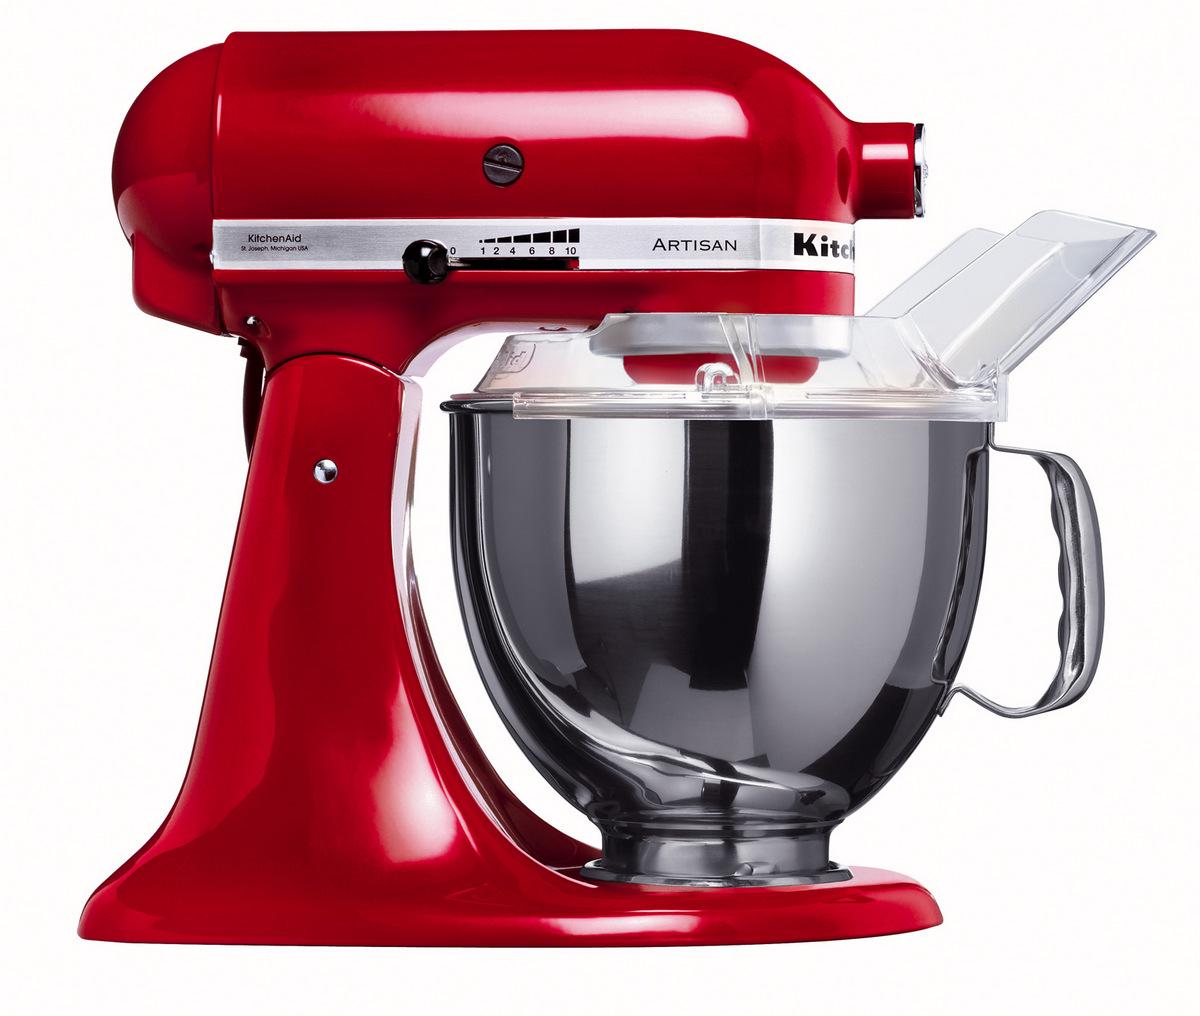 Kitchenaid-Artisan-5KSM150-Stand-Mixer.jpg